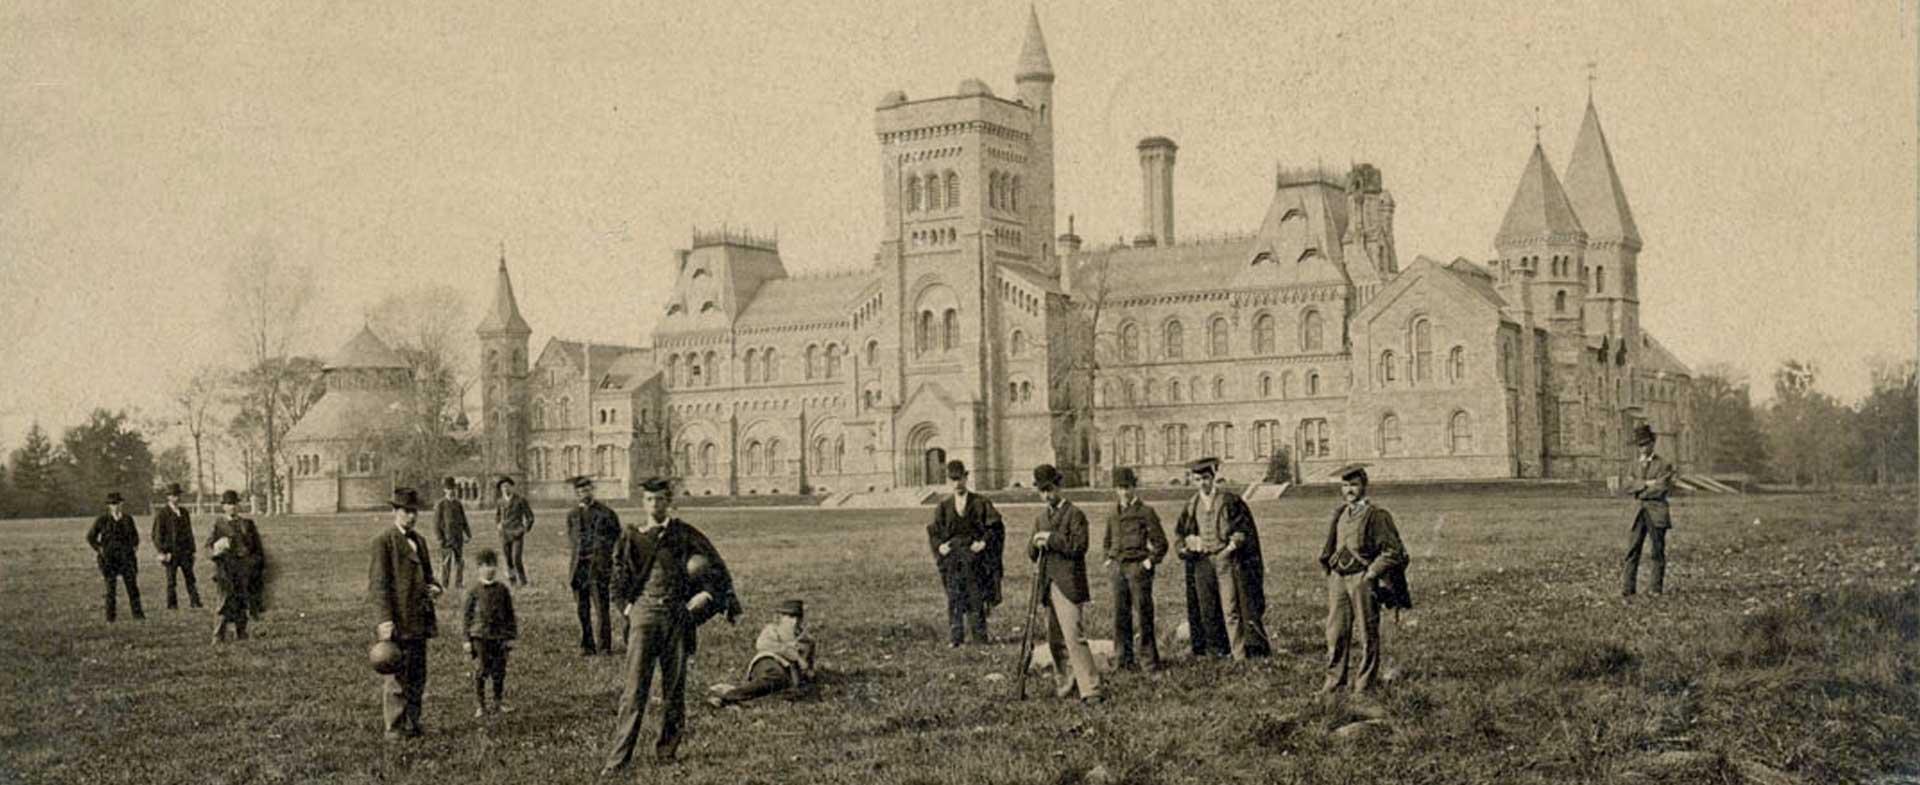 University of Toronto: Snapshot of its History